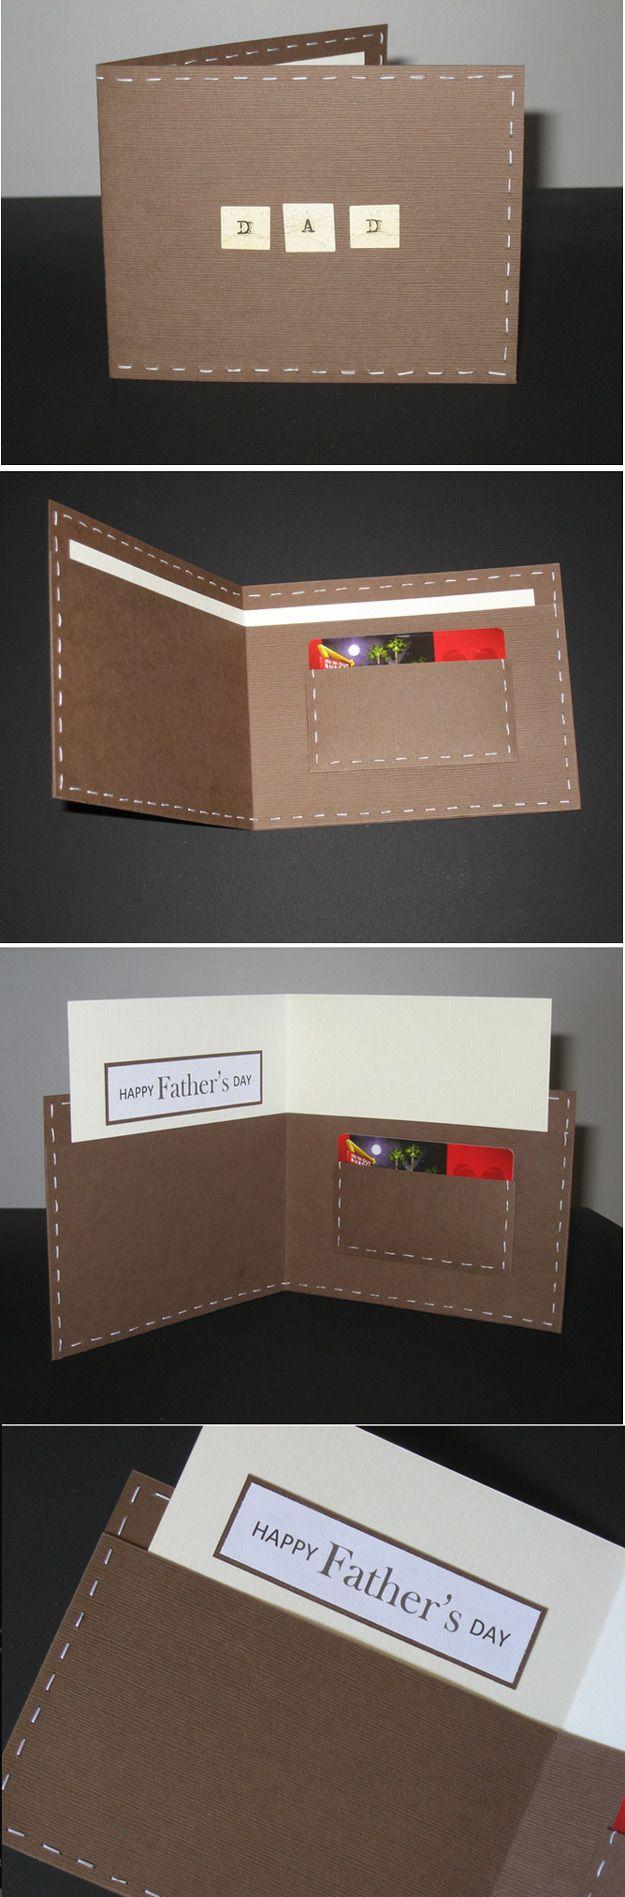 Cool DIY Fathers Day Card Ideas   DIY Wallet Card by DIY Ready at diyready.com/....